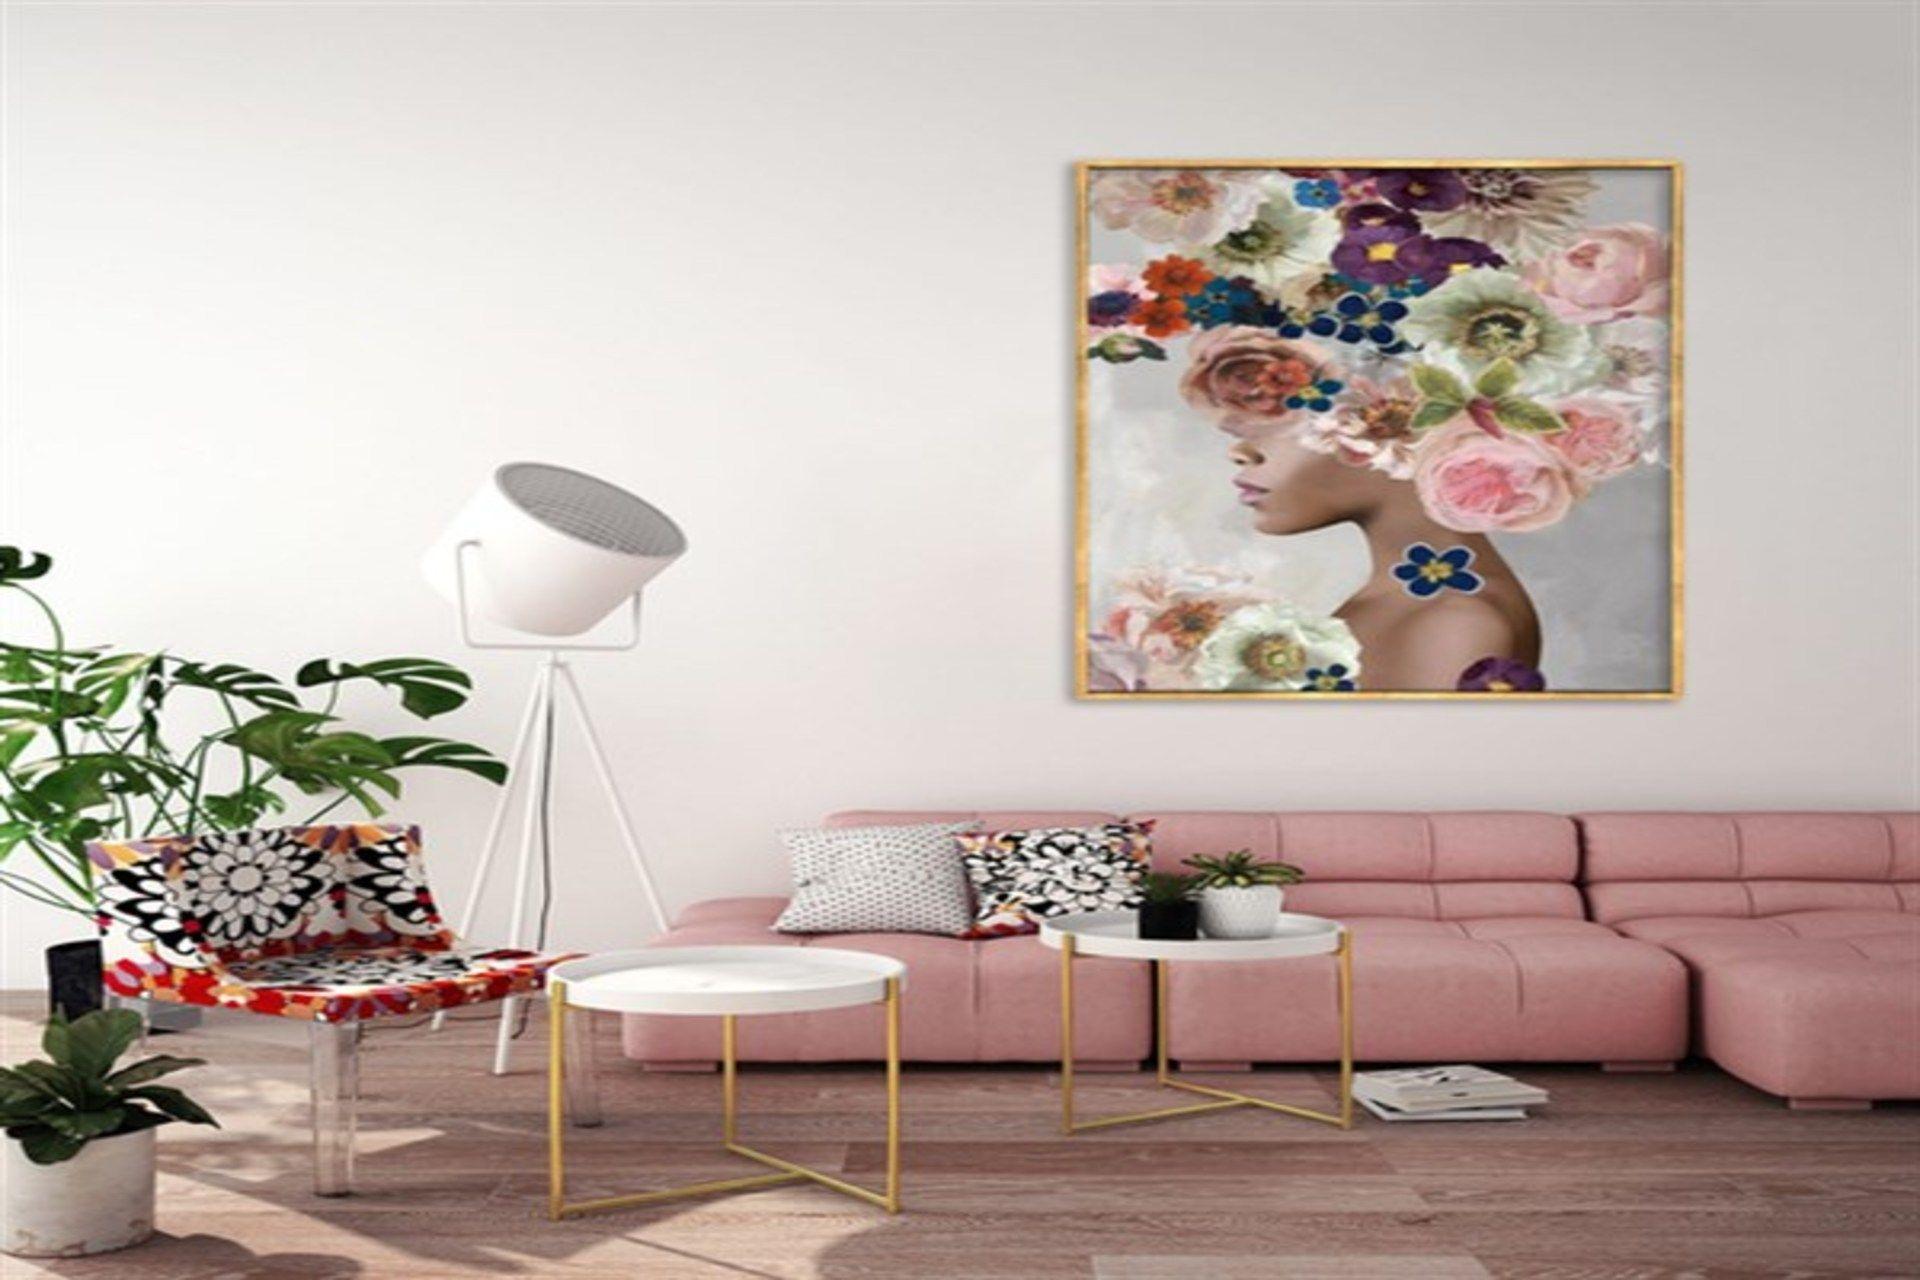 TABLOLİFE WOMEN IN FLOWERS 2 YAĞLI BOYA DOKULU TABLO  90X120 CM